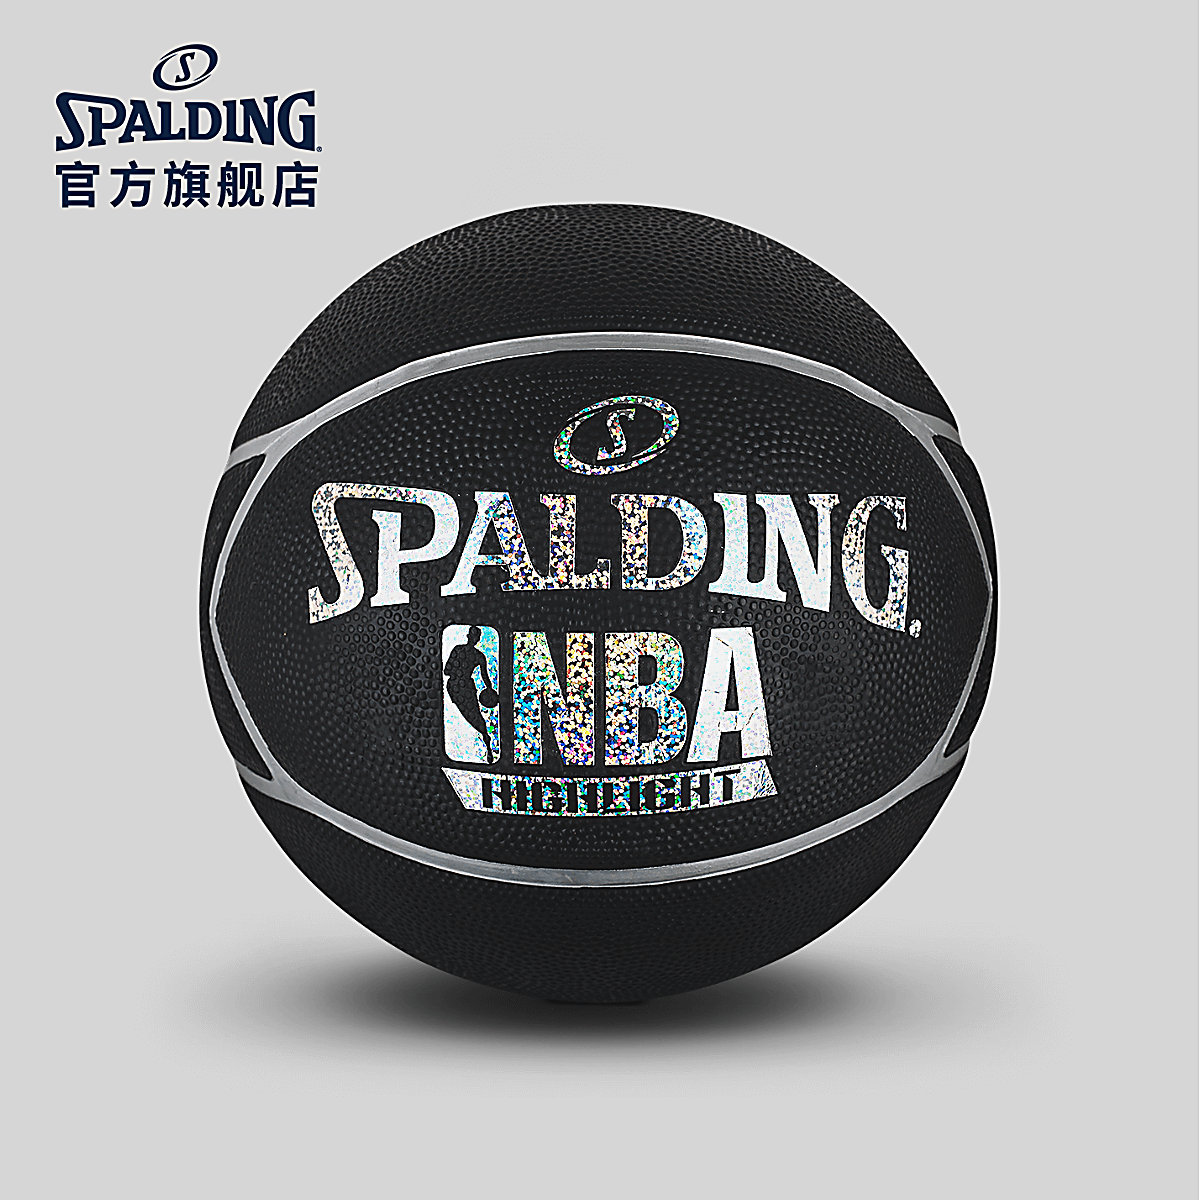 SPALDING официальный флагманский магазин Highlight серебро вспышка звезда форма стол кожа резина баскетбол 83-497Y